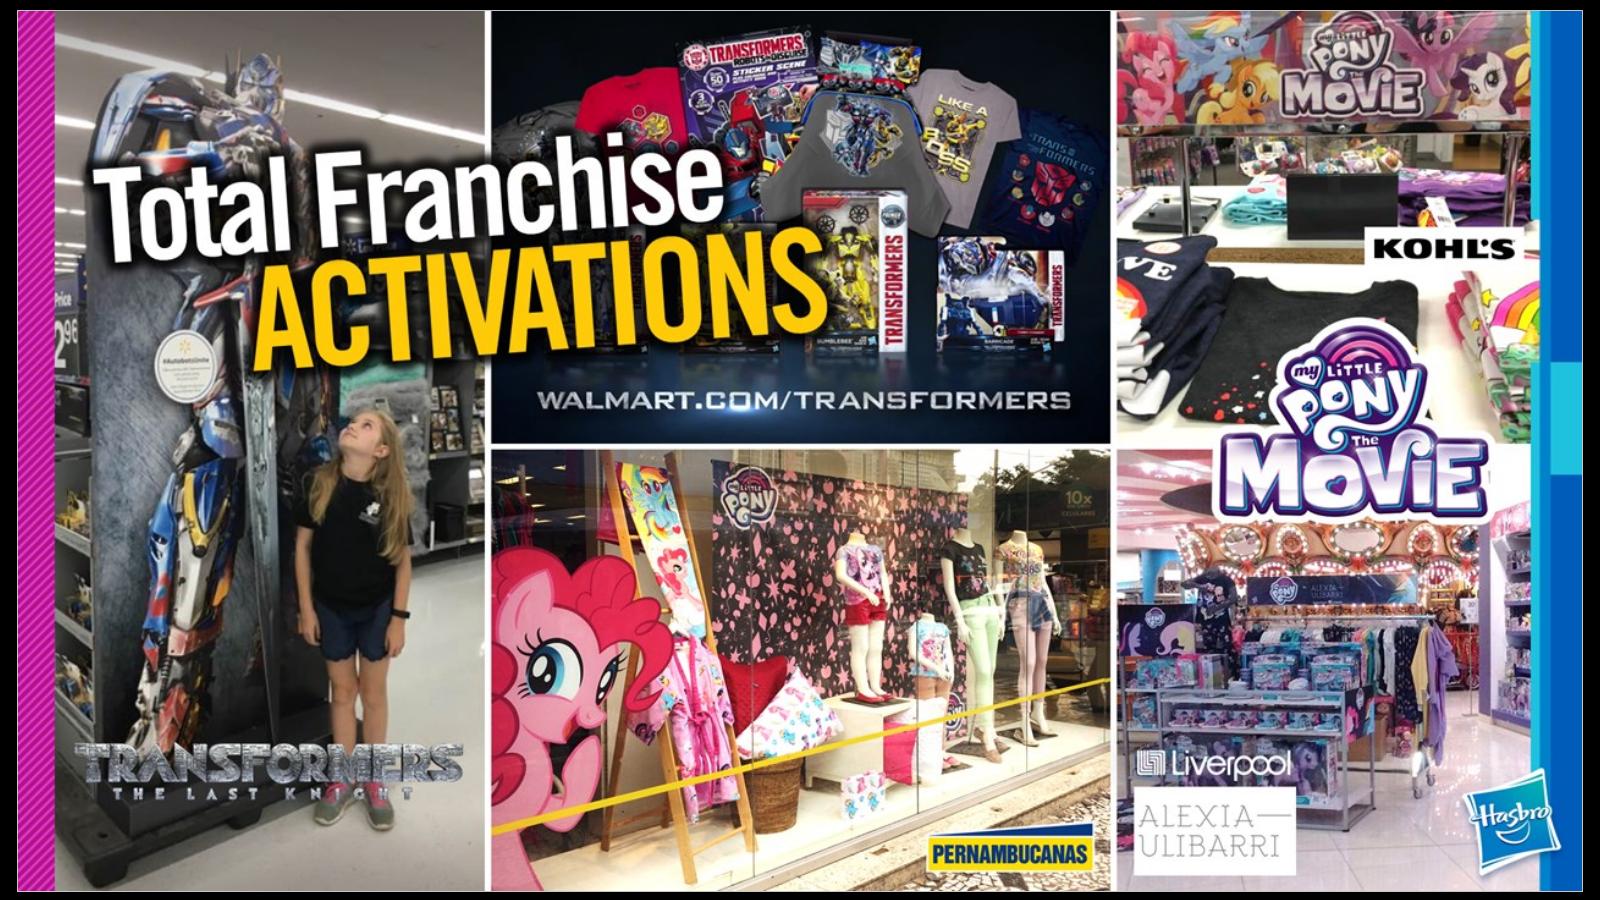 Transformers News: New York Toy Fair 2018 General Coverage #HasbroToyFair #TFNY